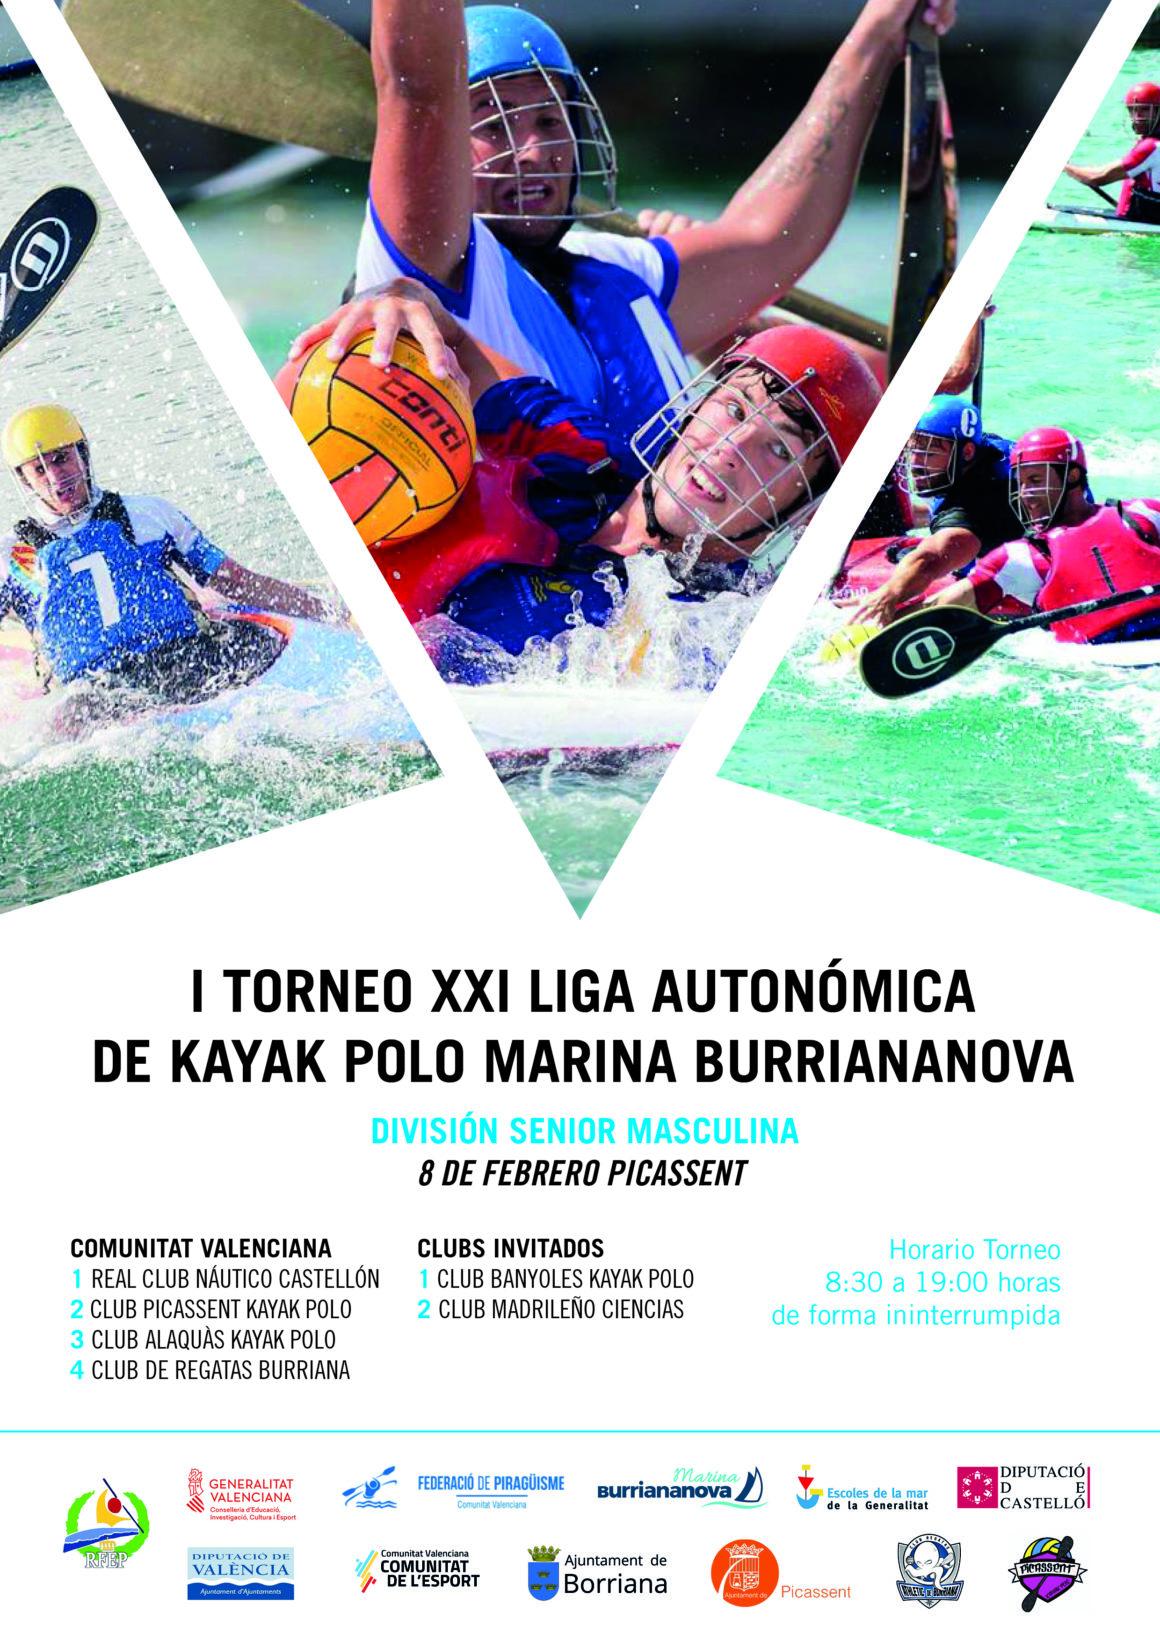 Comença l'I Torneig XXI Lliga Autonòmica de caiac pol MARINA BURRIANANOVA a Picassent